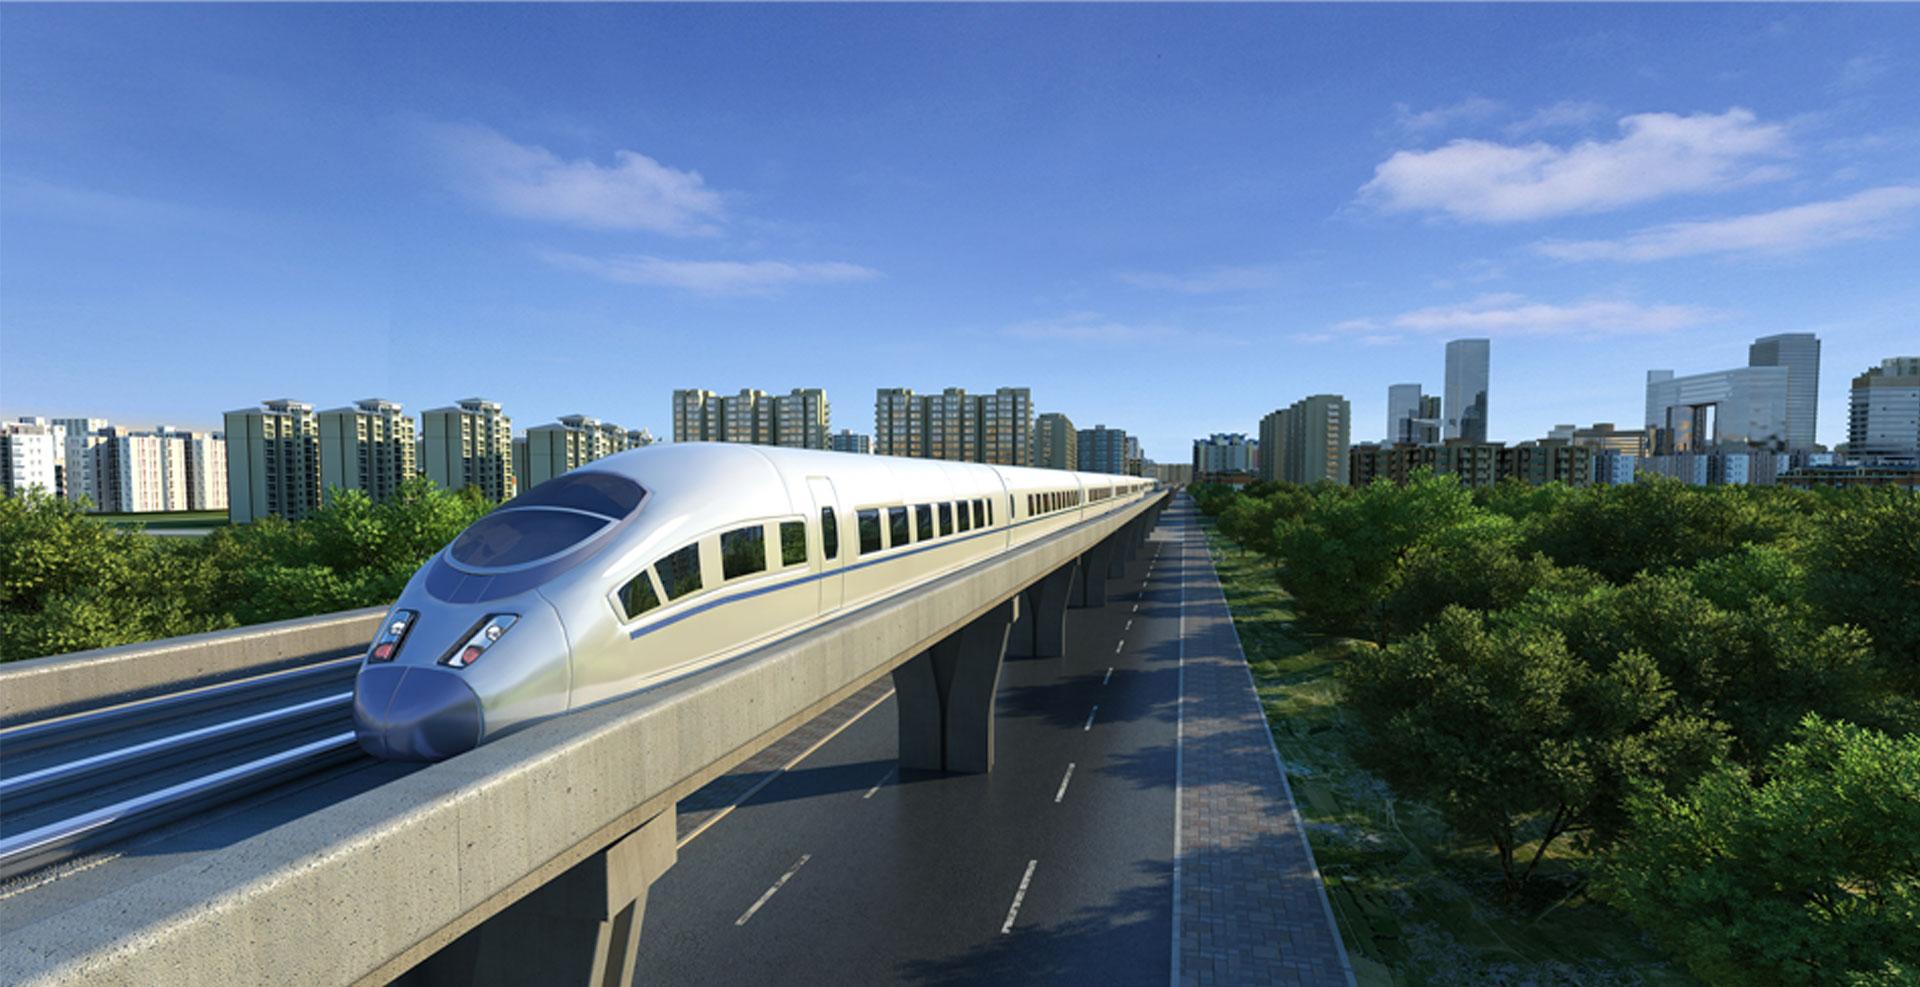 Application of KSCAN-MAGIC 3D Scanner in Railway Bridge Inspection